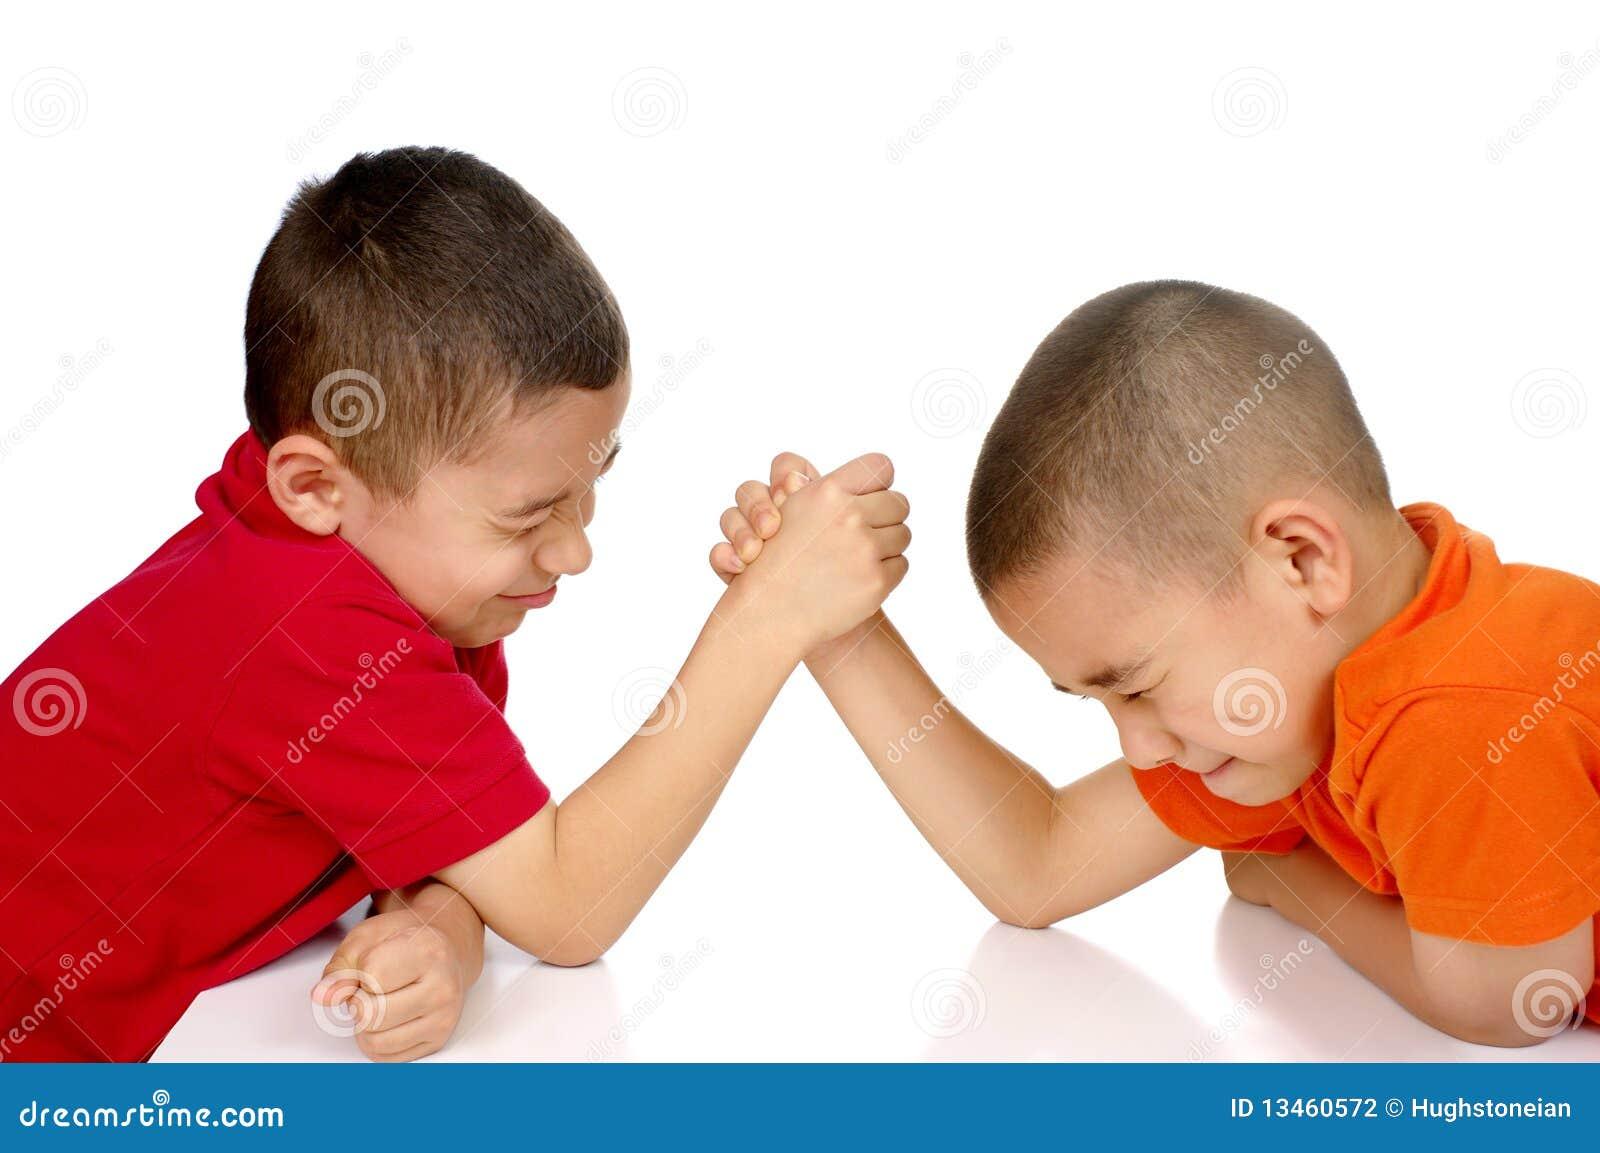 Kids Arm Wrestling Stock Photography - Image: 13460572